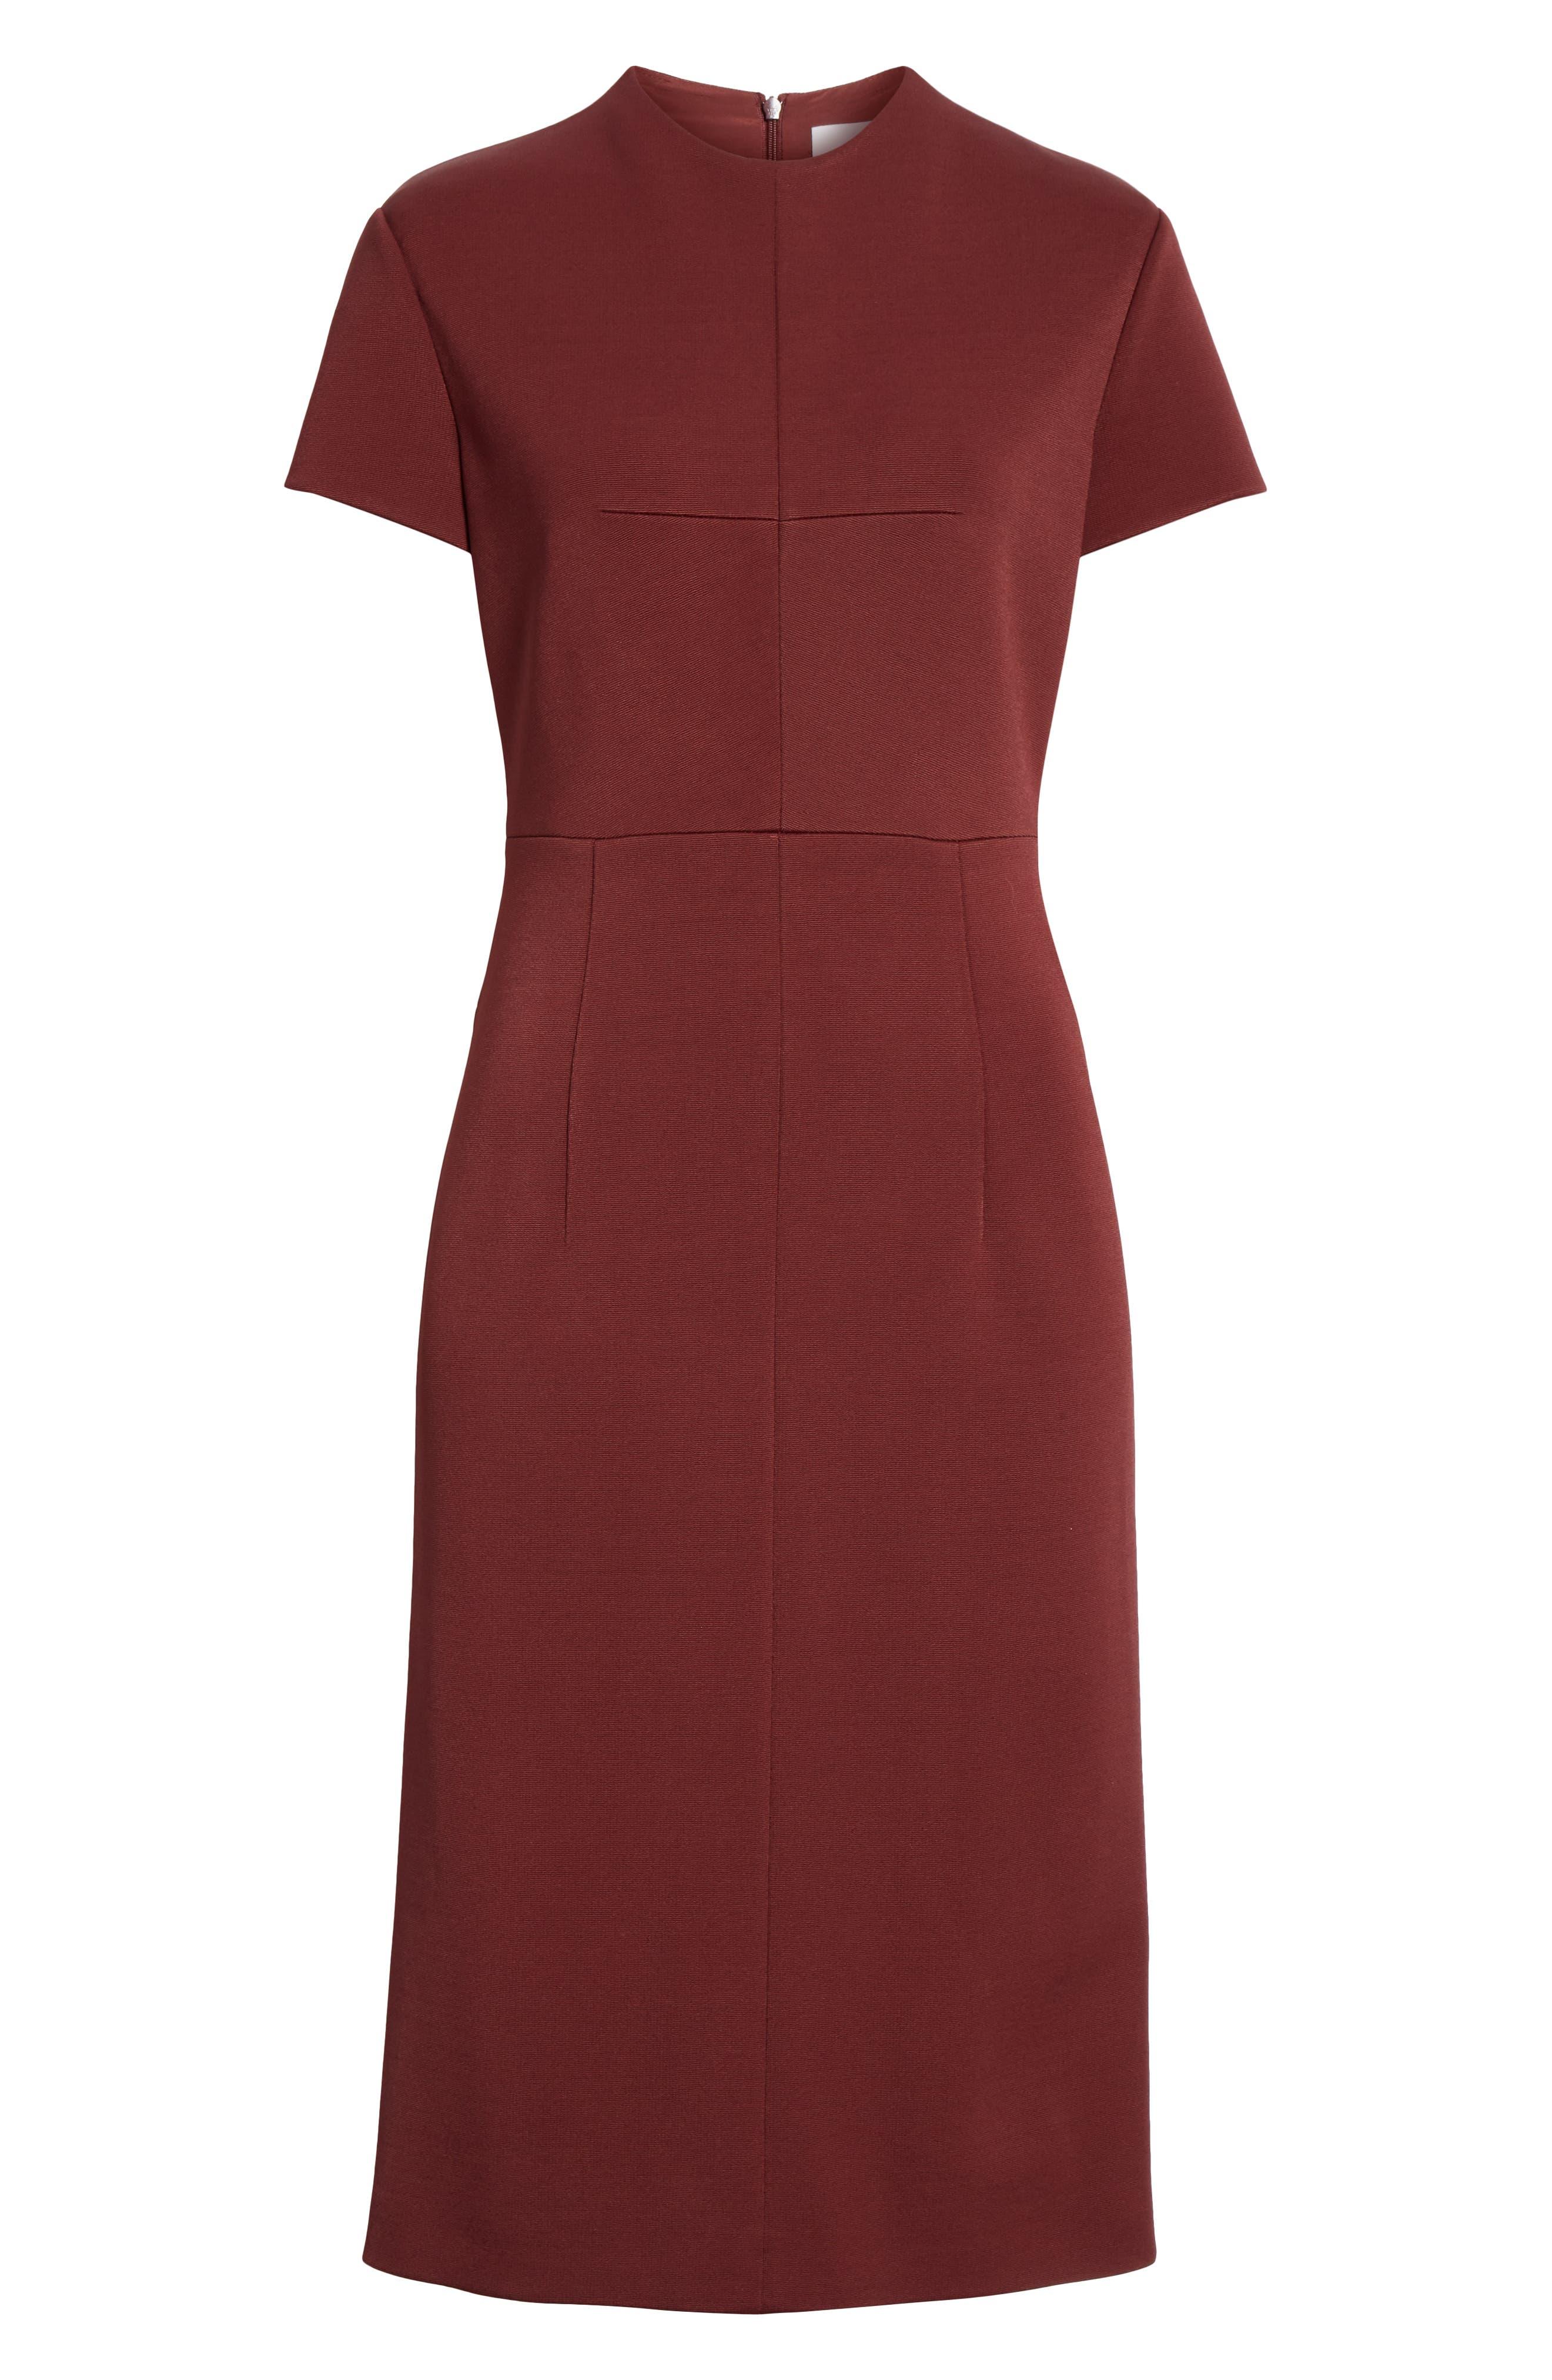 Demiara Sheath Dress,                             Alternate thumbnail 6, color,                             DARK AUBURN